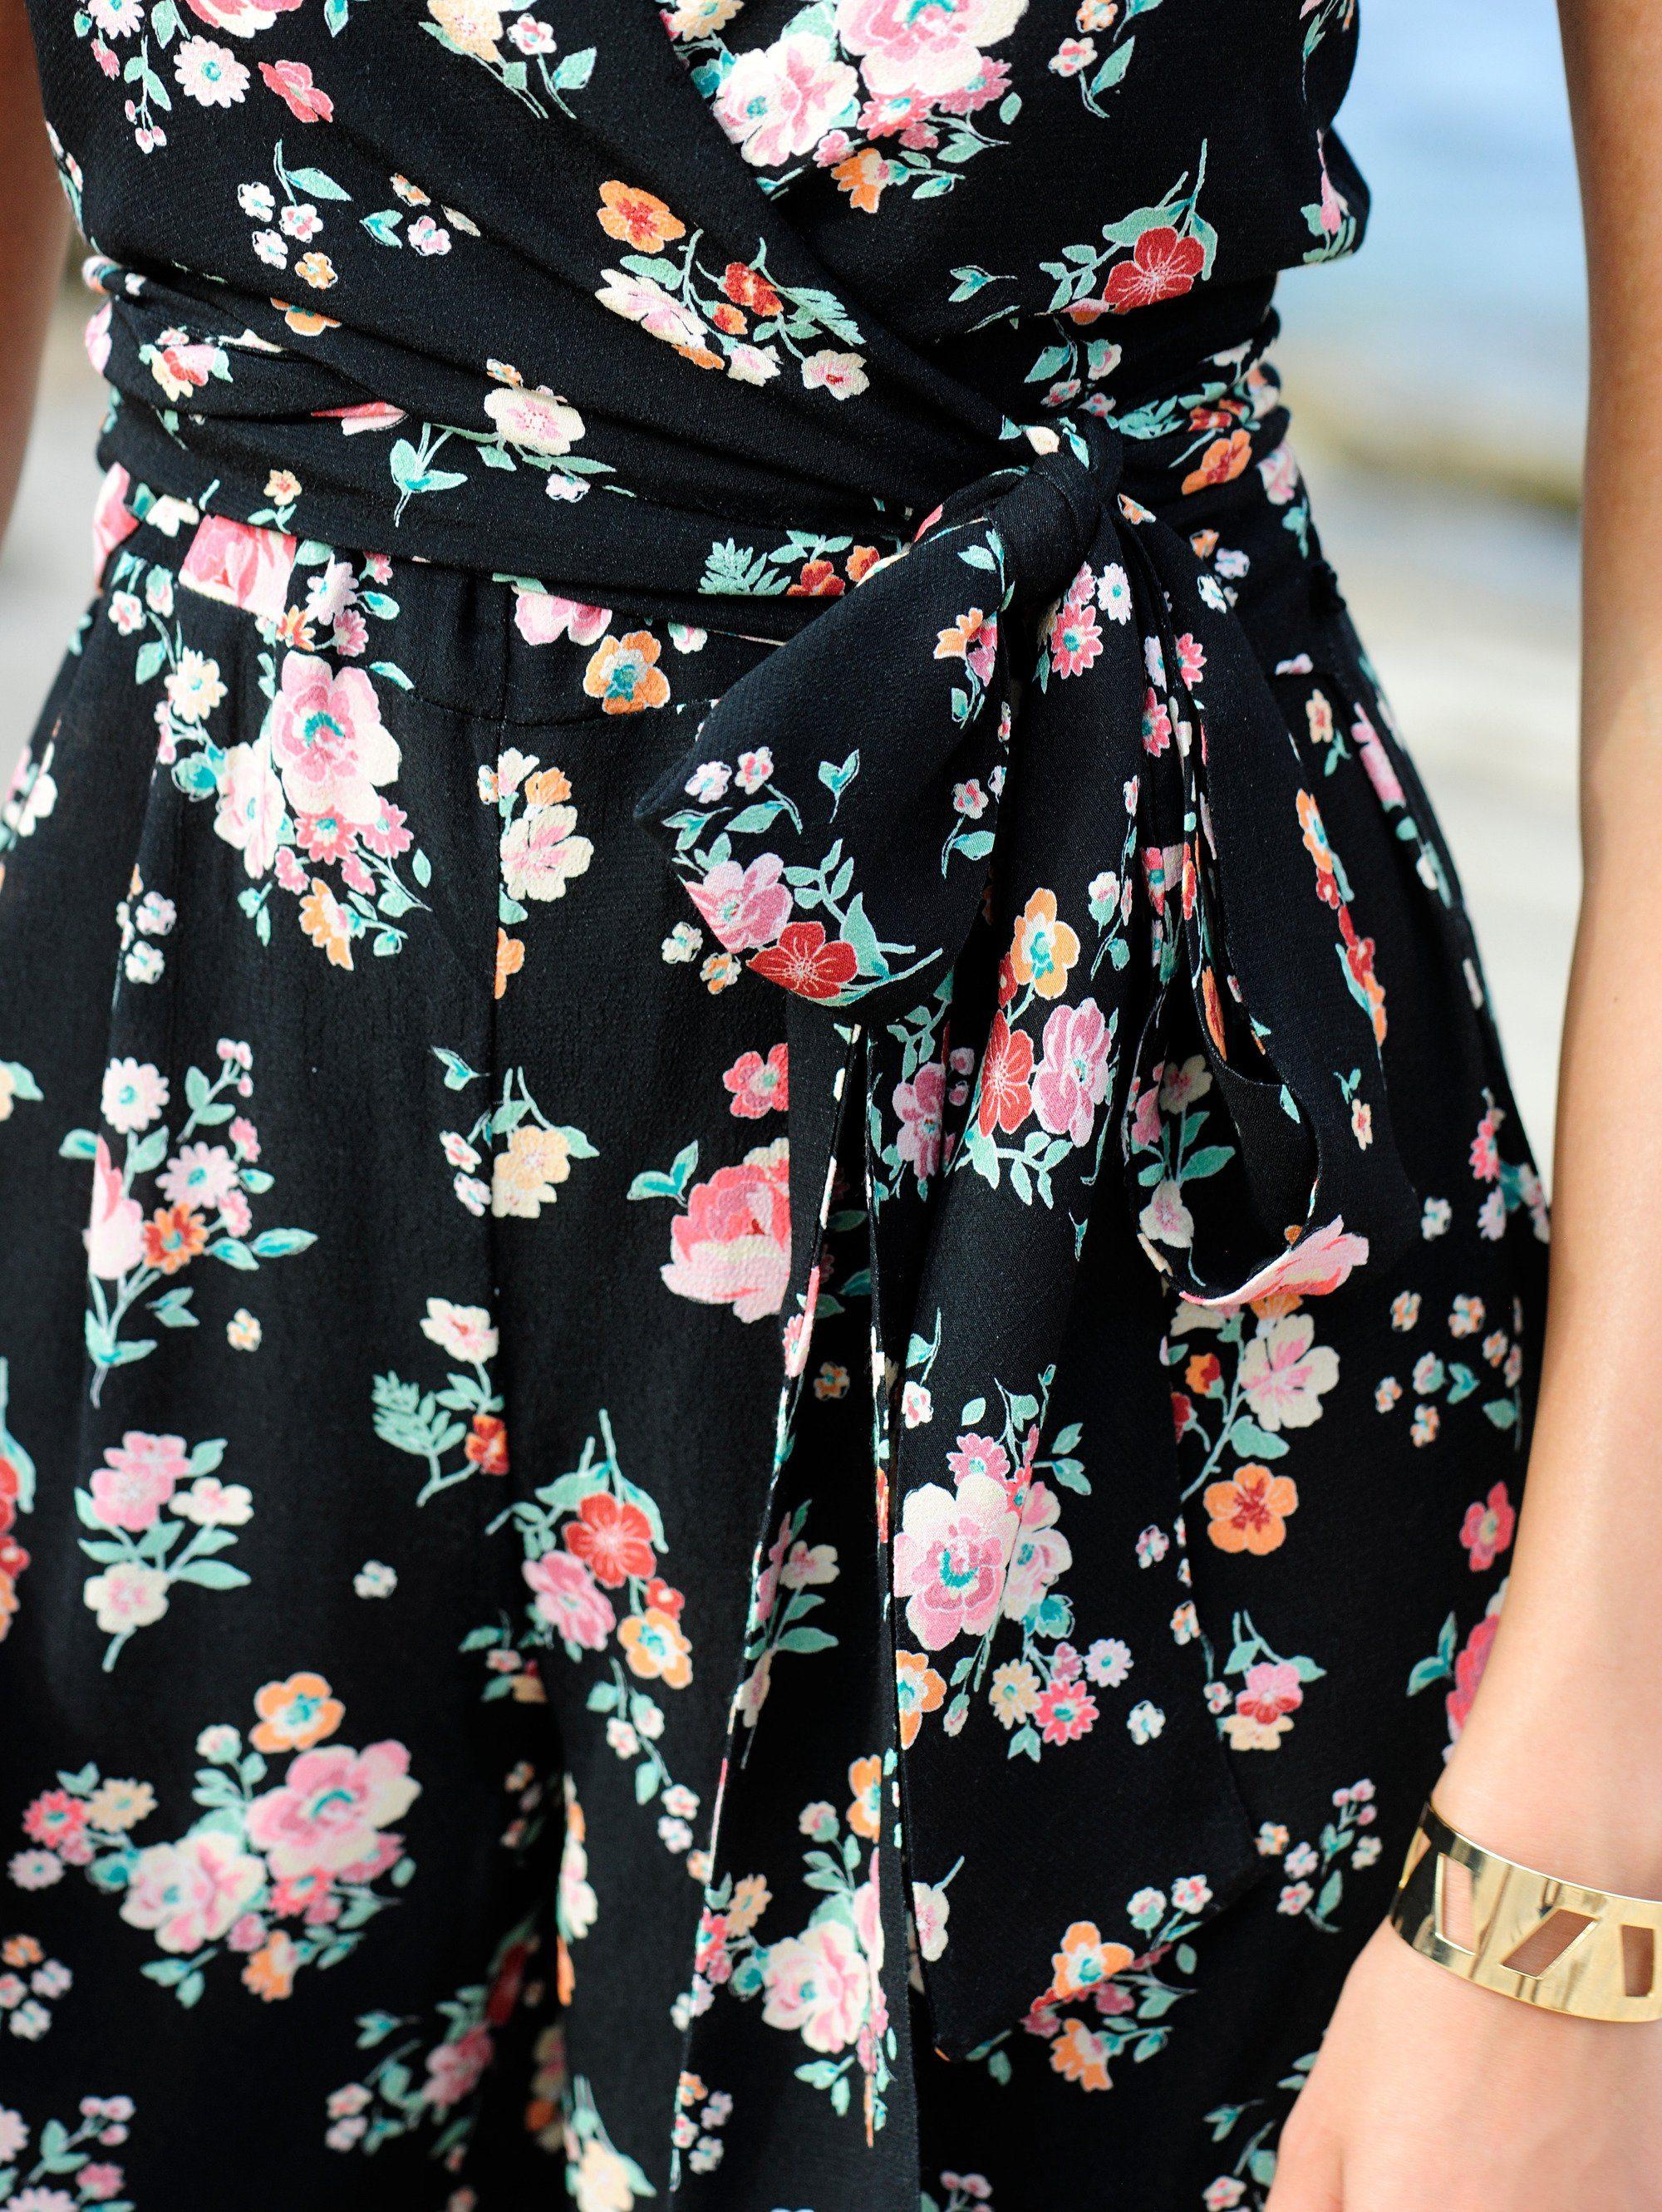 Alba Moda Strandoverall Mit Blumendessin, Verspielt Femininem Blumendruck Online Kaufen